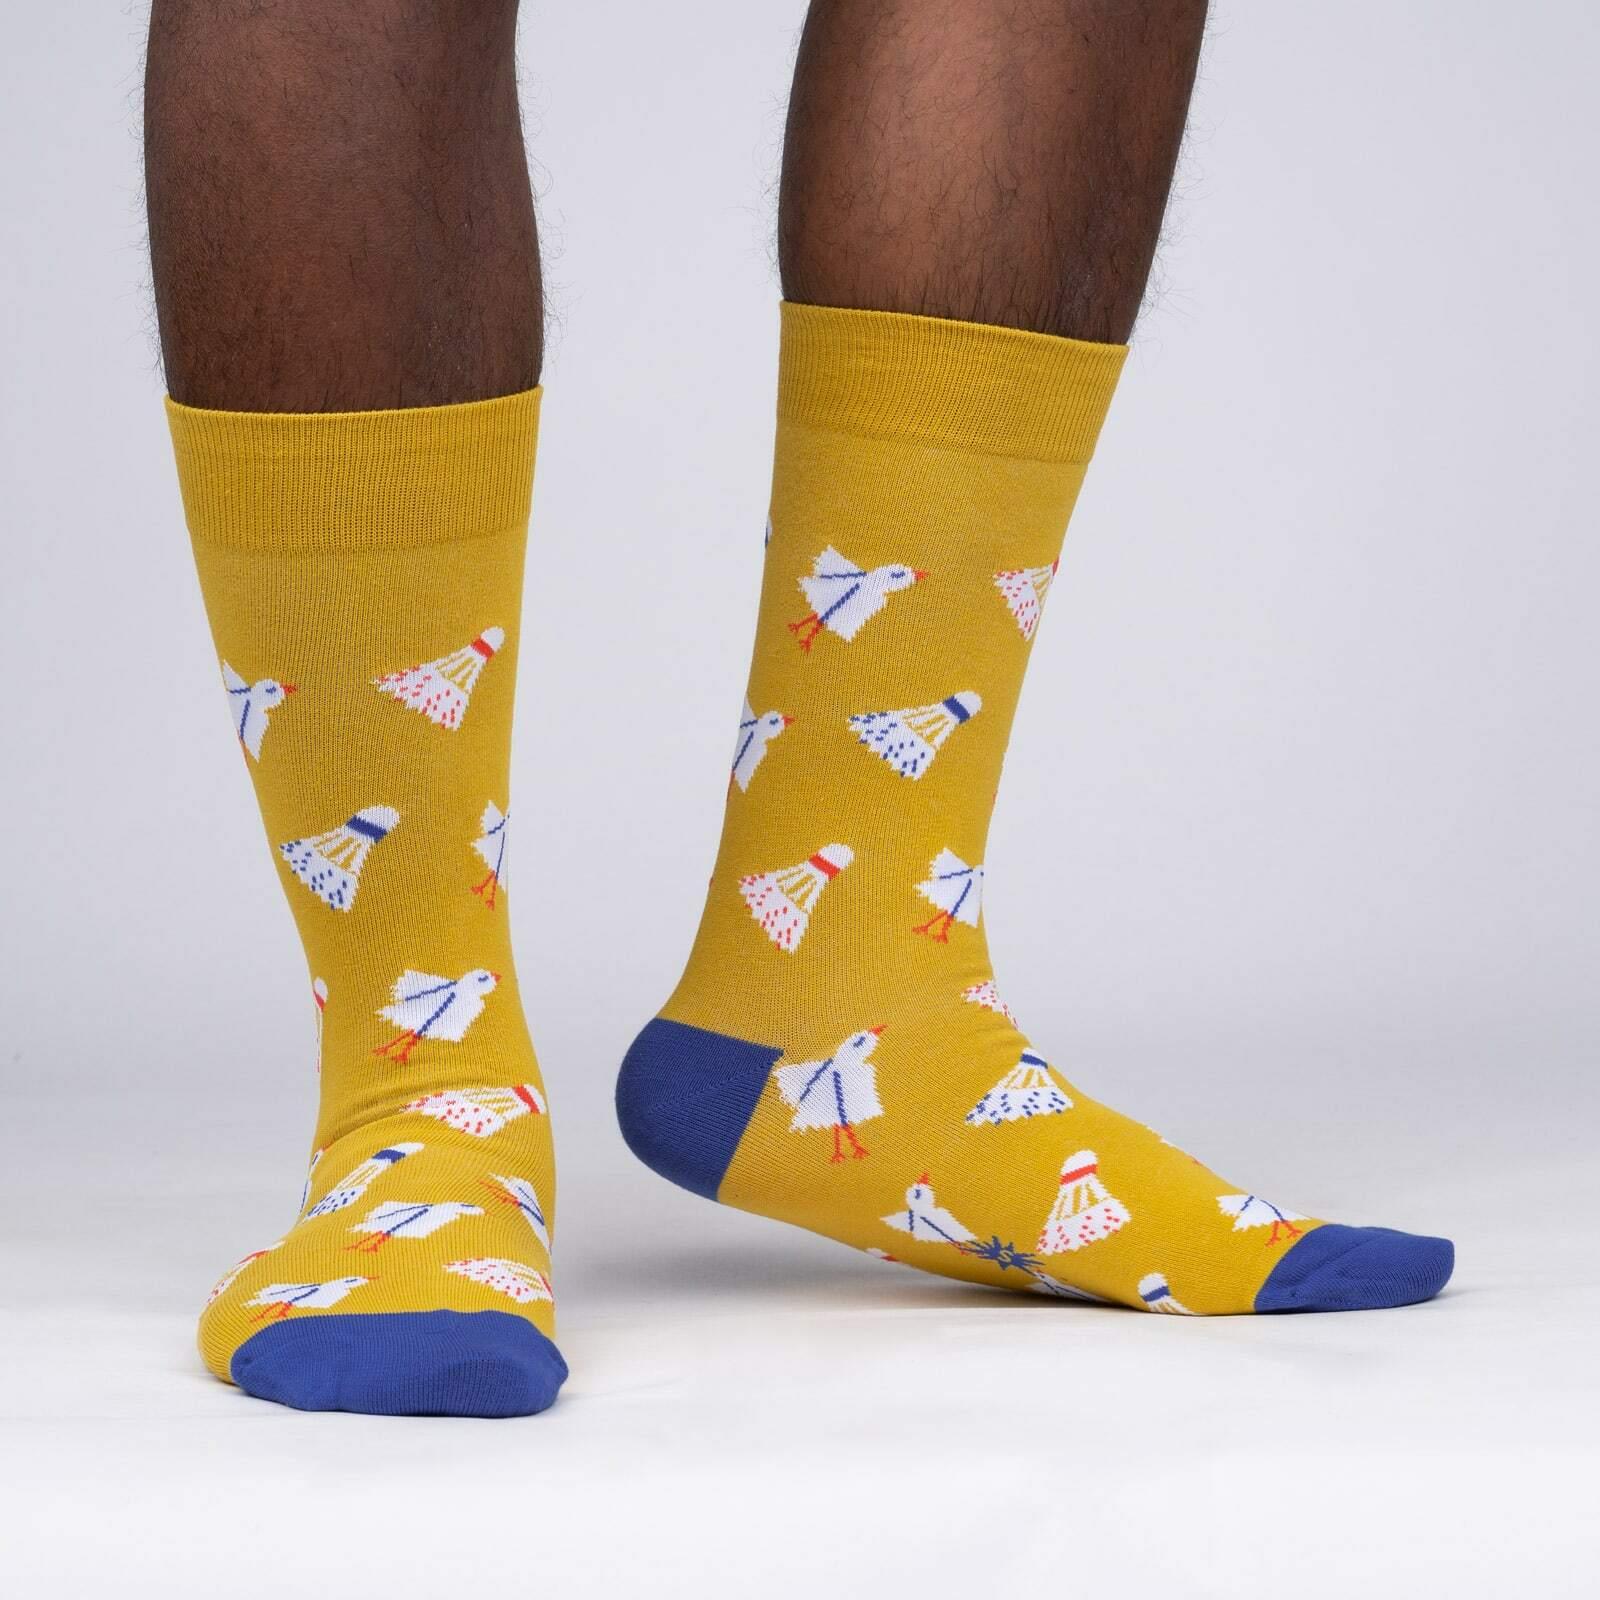 Shuttle Sock - Badminton Sports Yellow Men's Crew Socks - Sock It to Me in Yellow